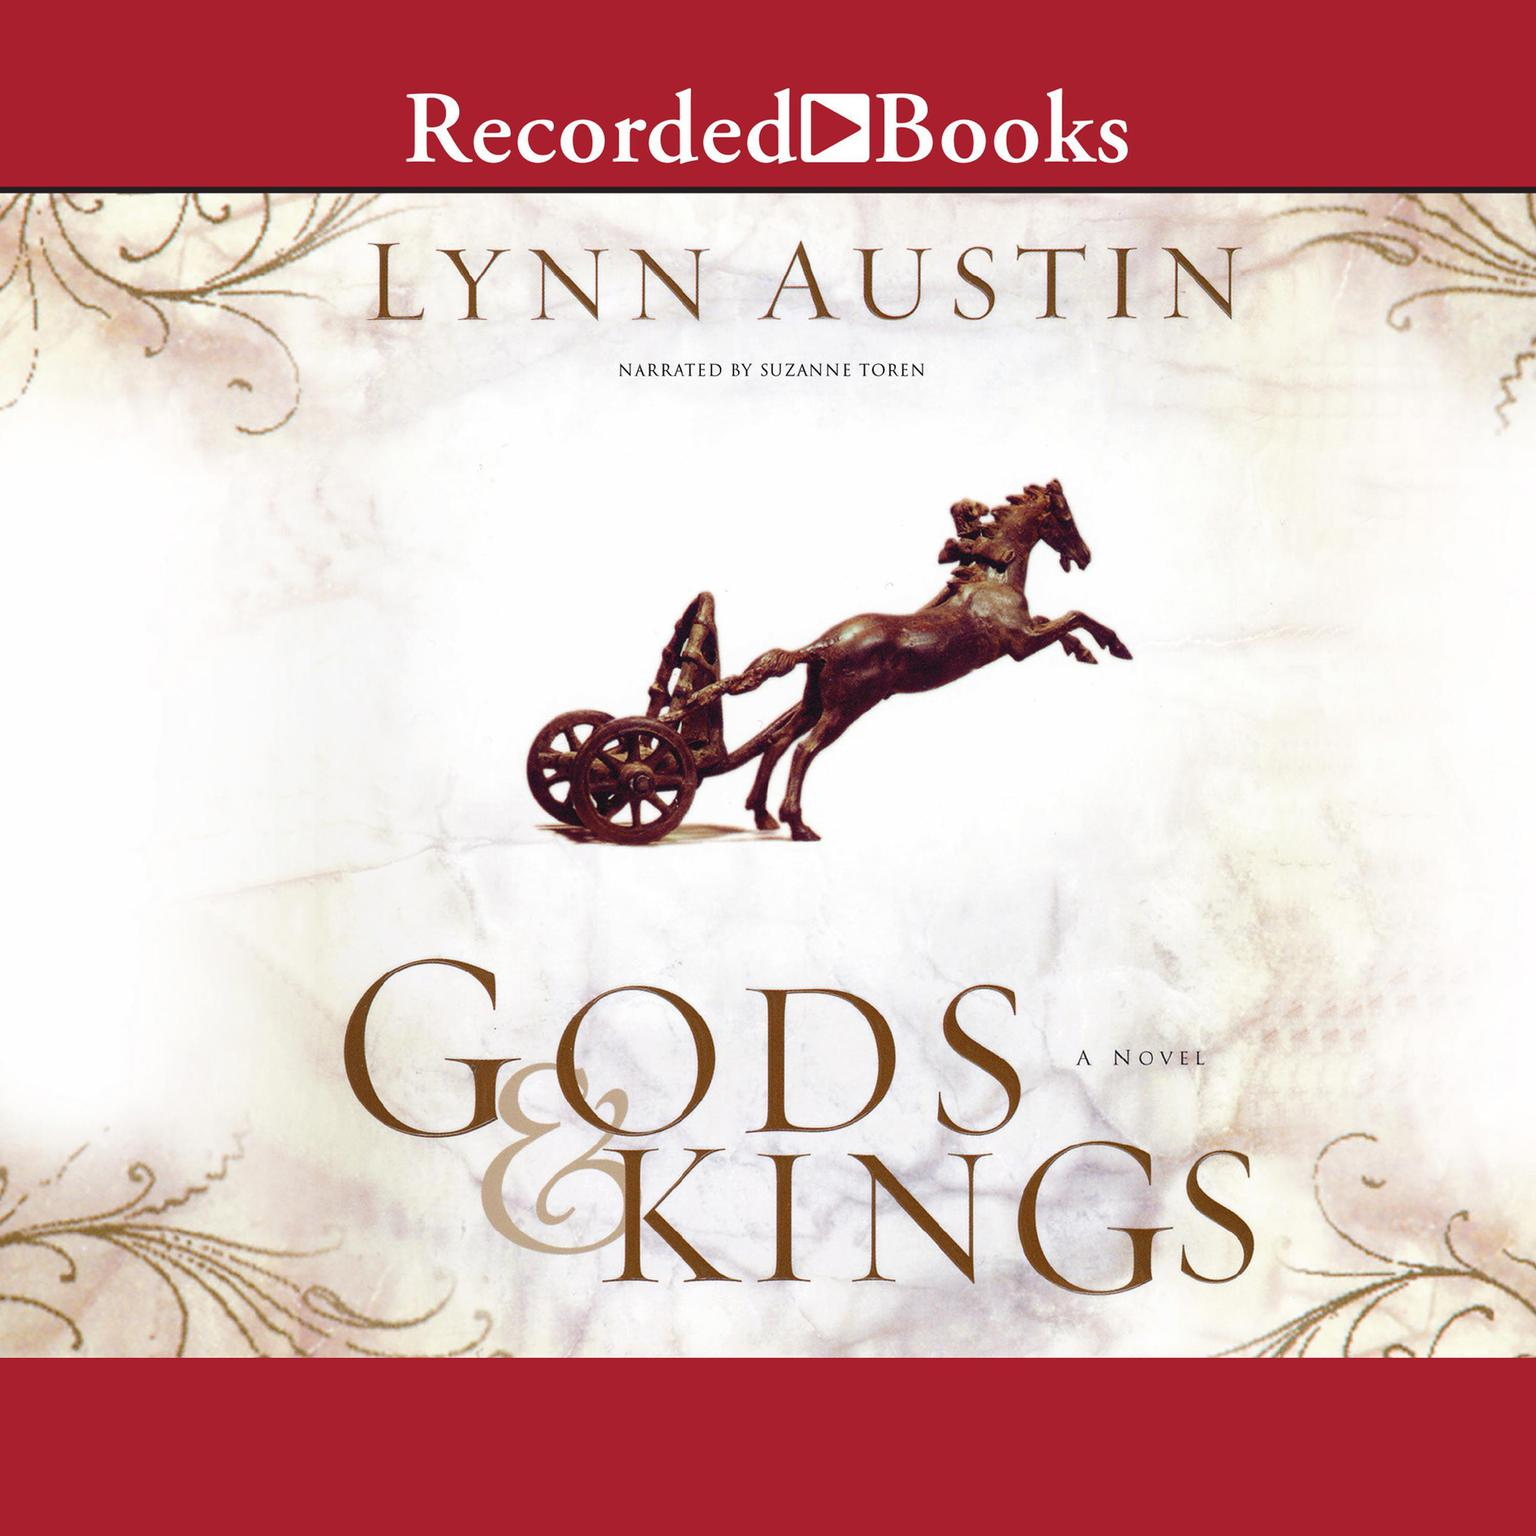 Gods and Kings: A Novel Audiobook, by Lynn Austin